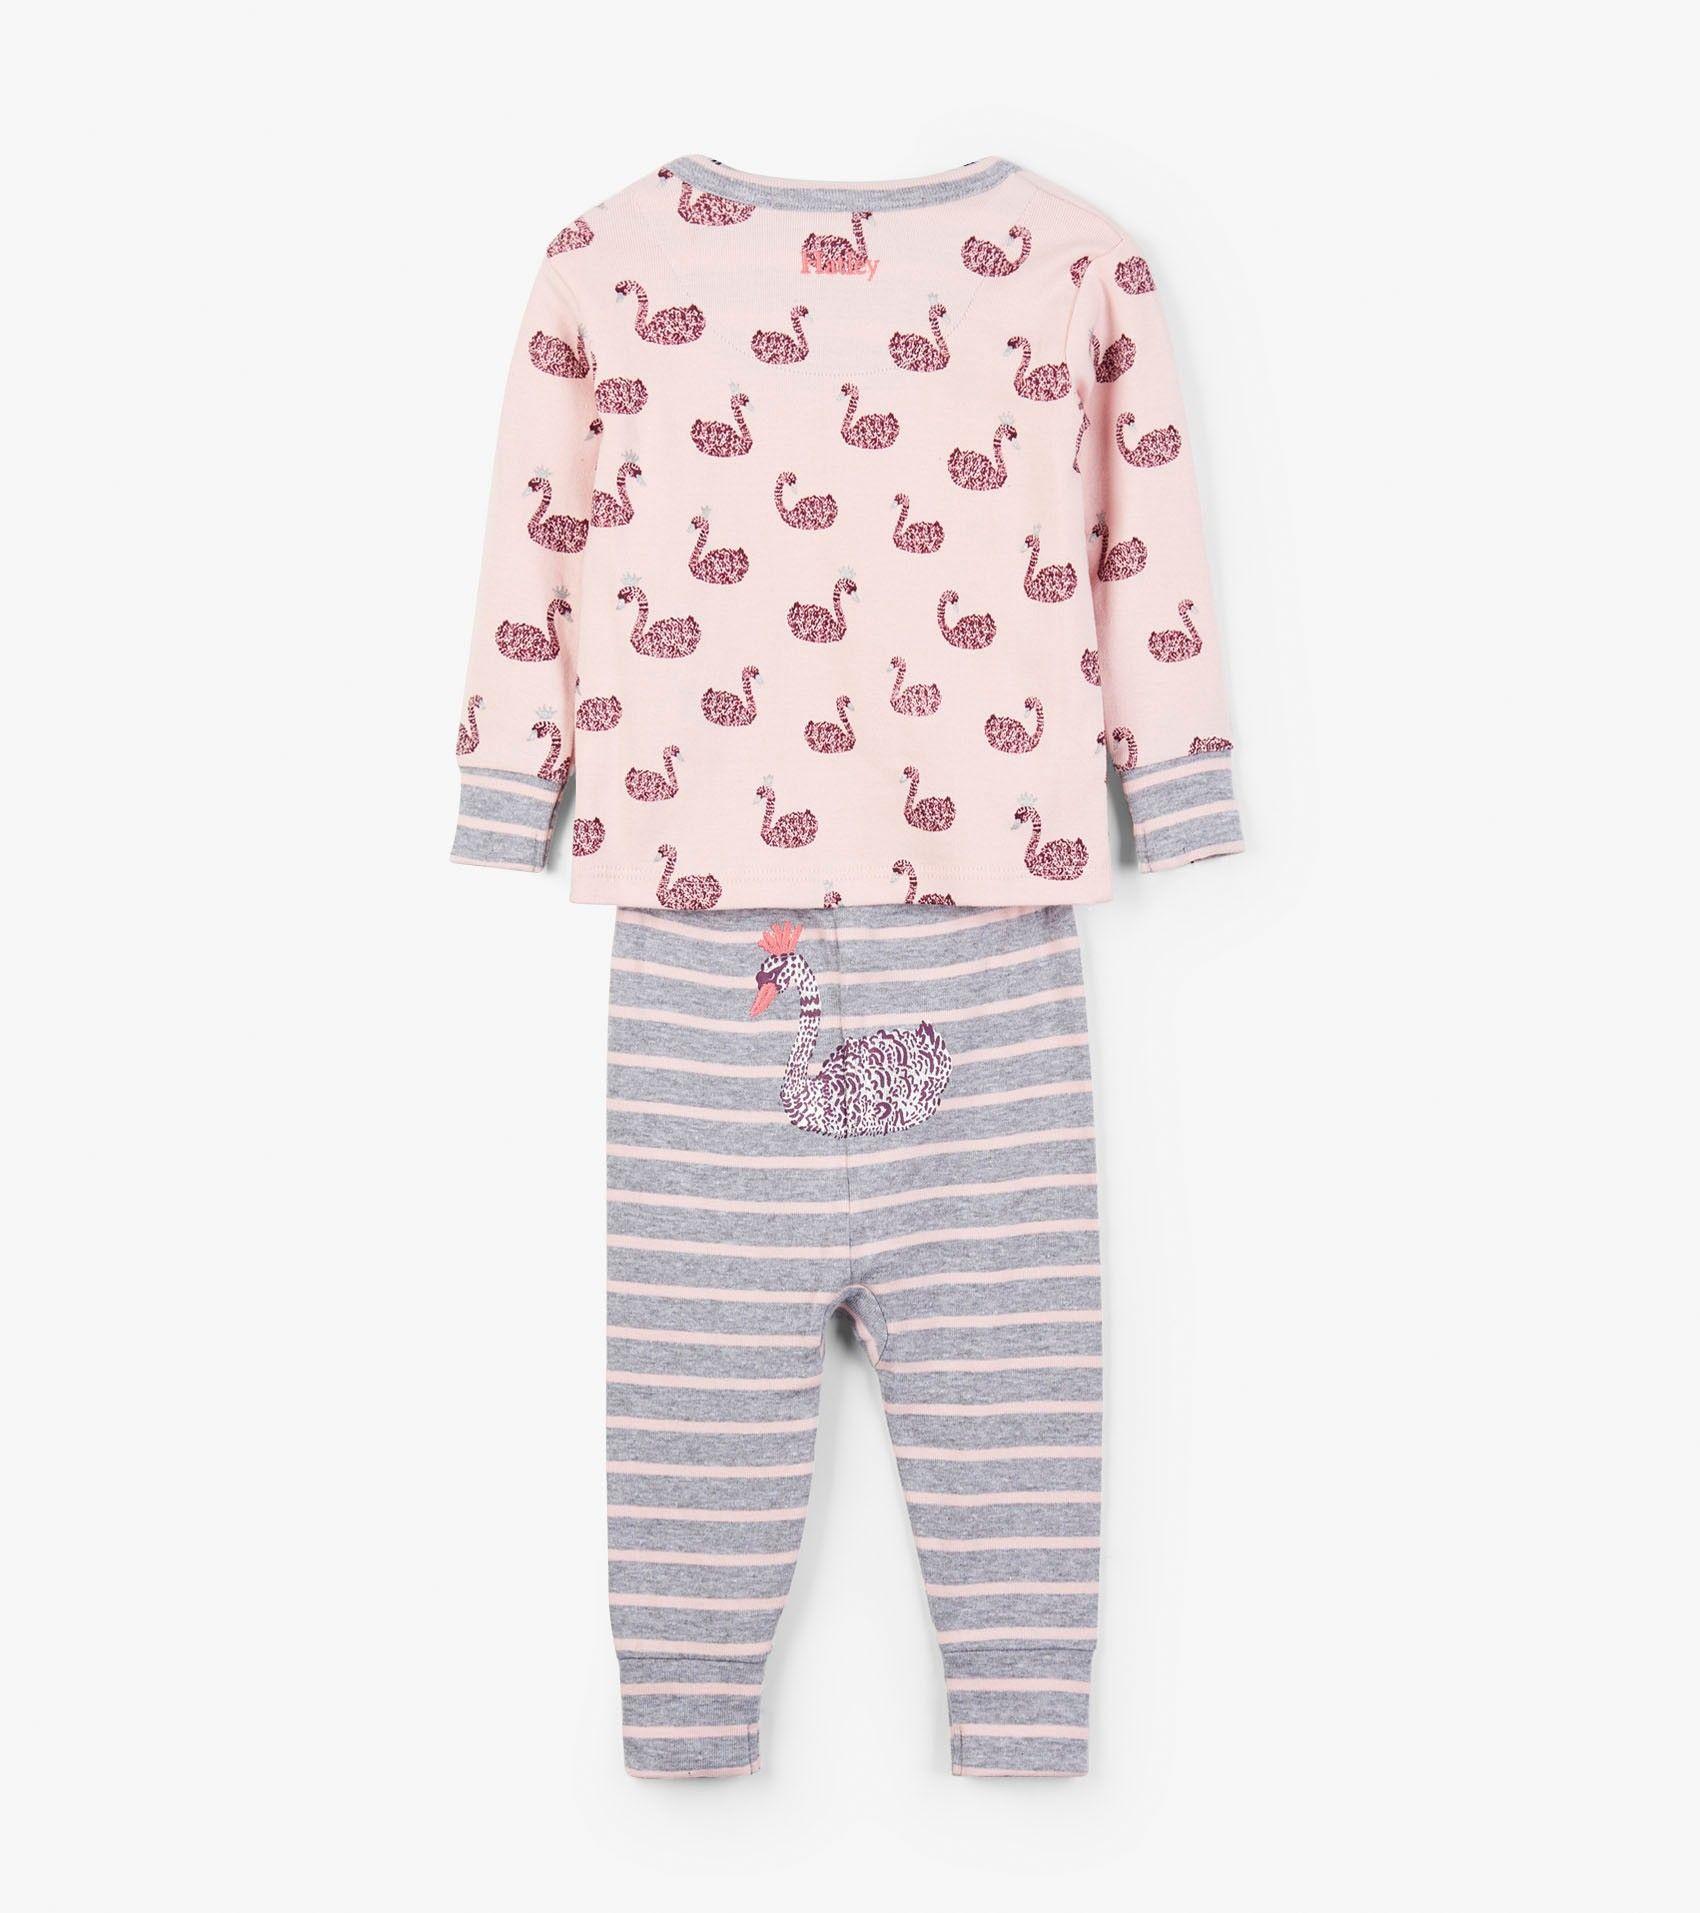 Swan Lake Organic Cotton Baby Pajama Set Sleepwear Categories Baby Girls Hatley Canada Pajama Set Kids Robes Pajamas